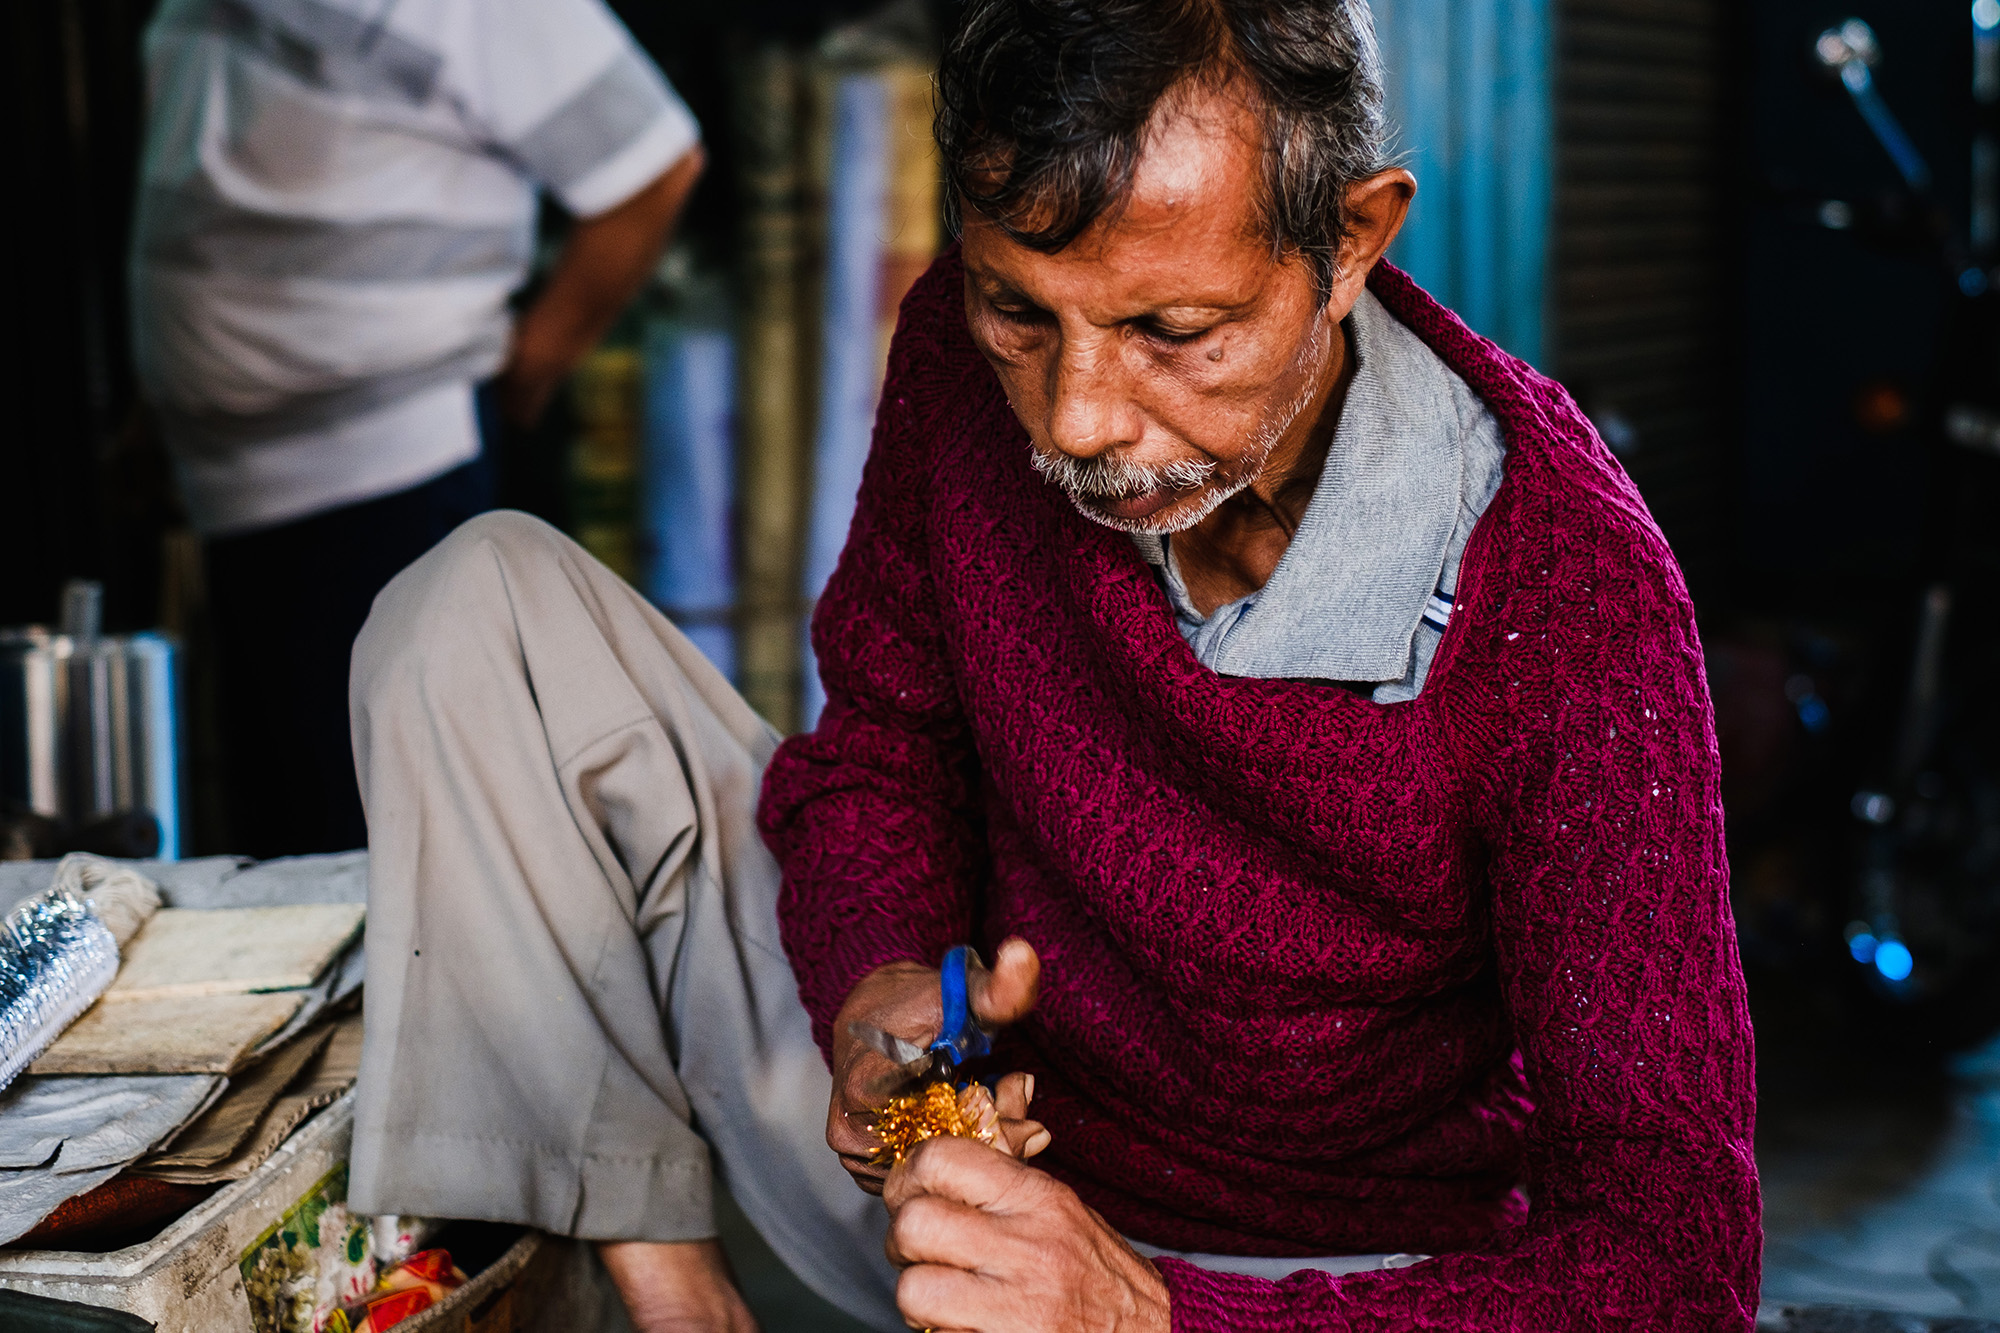 AnjaPoehlmann_India-Kolkata_089.jpg